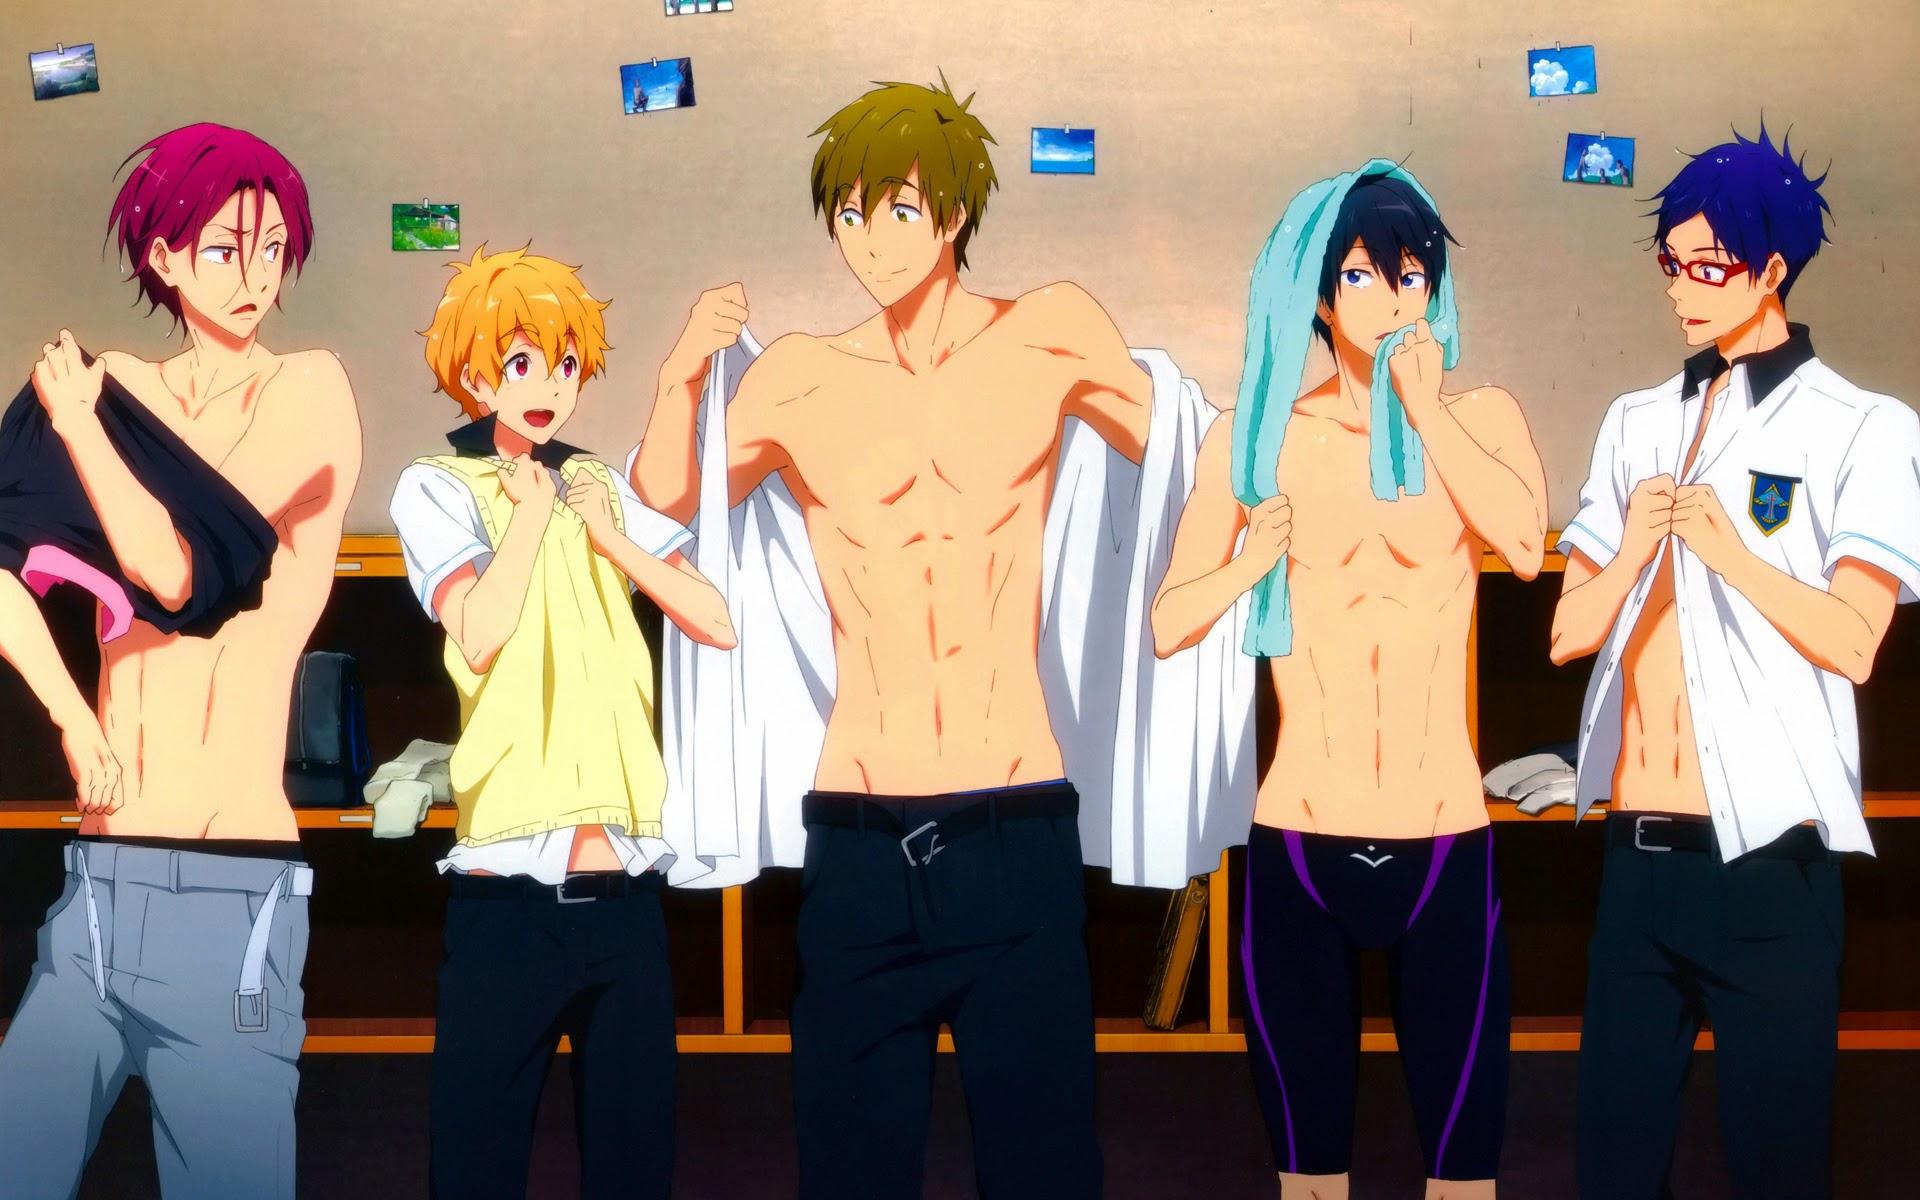 Iwatobi Swim Club Anime 02b HD Wallpaper 1920x1200